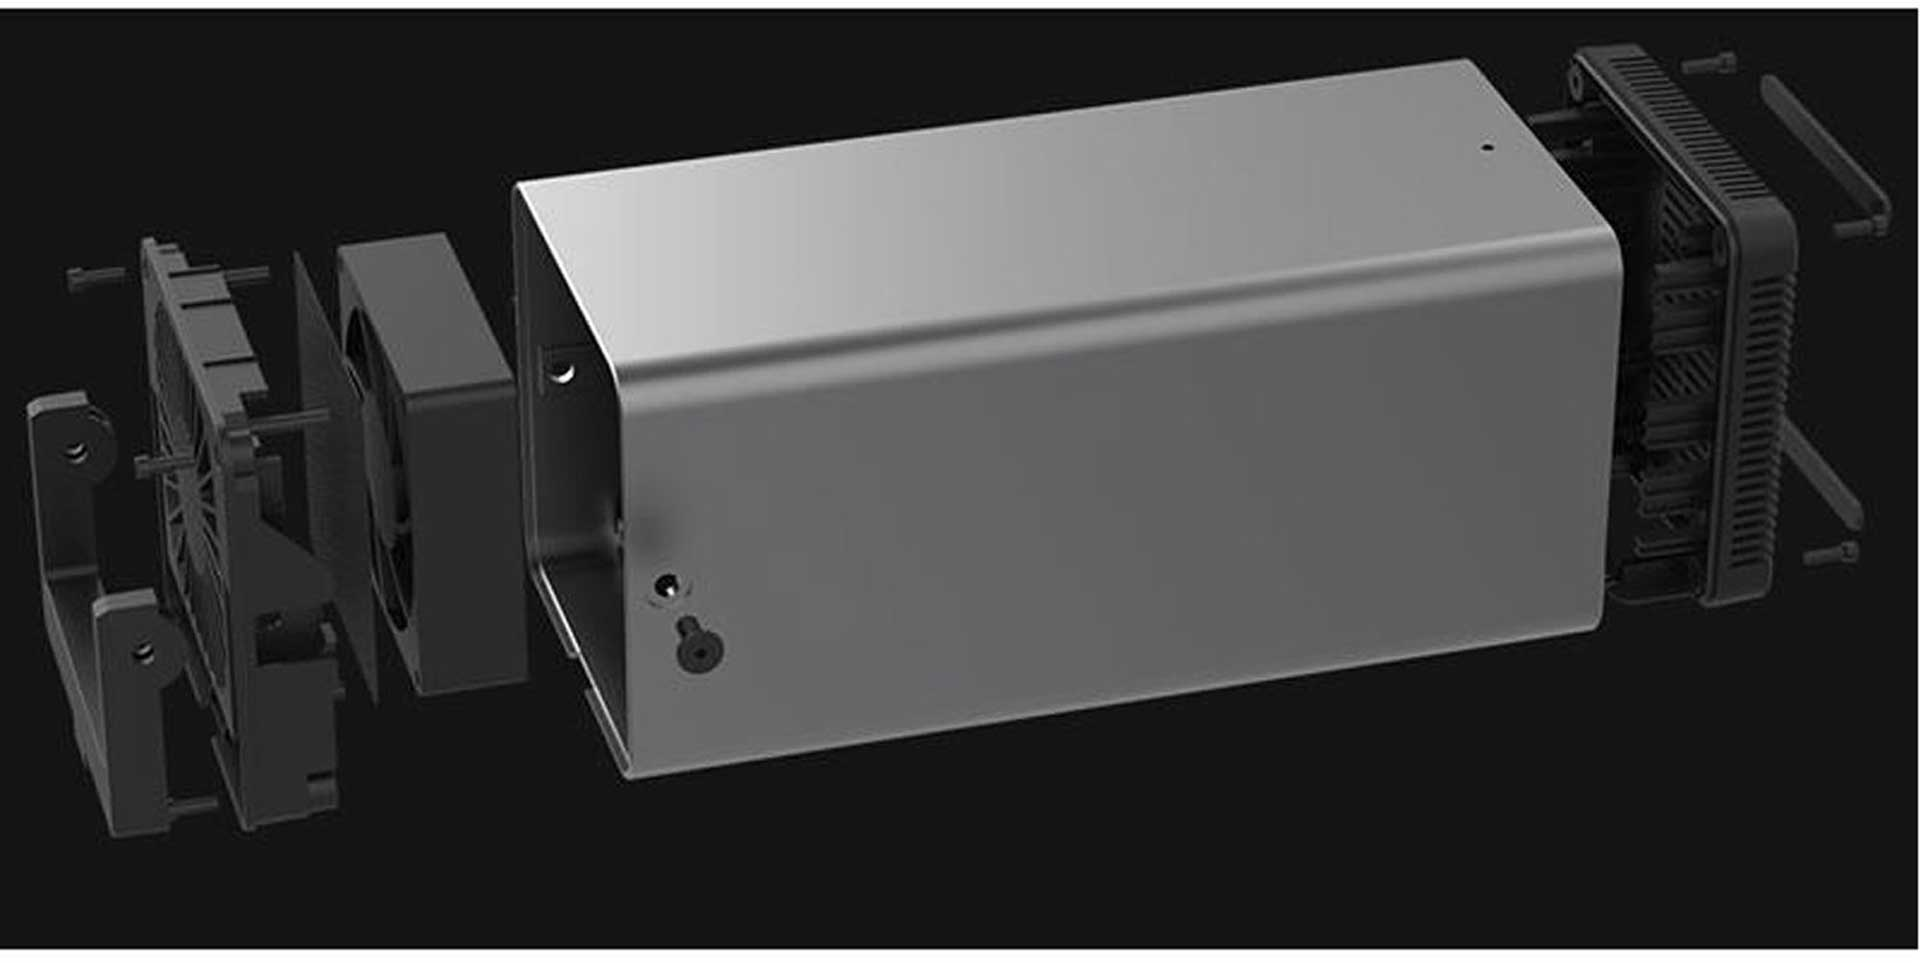 ISDT SP3050 Smart Power Power Supply 1800W with Battgo technology